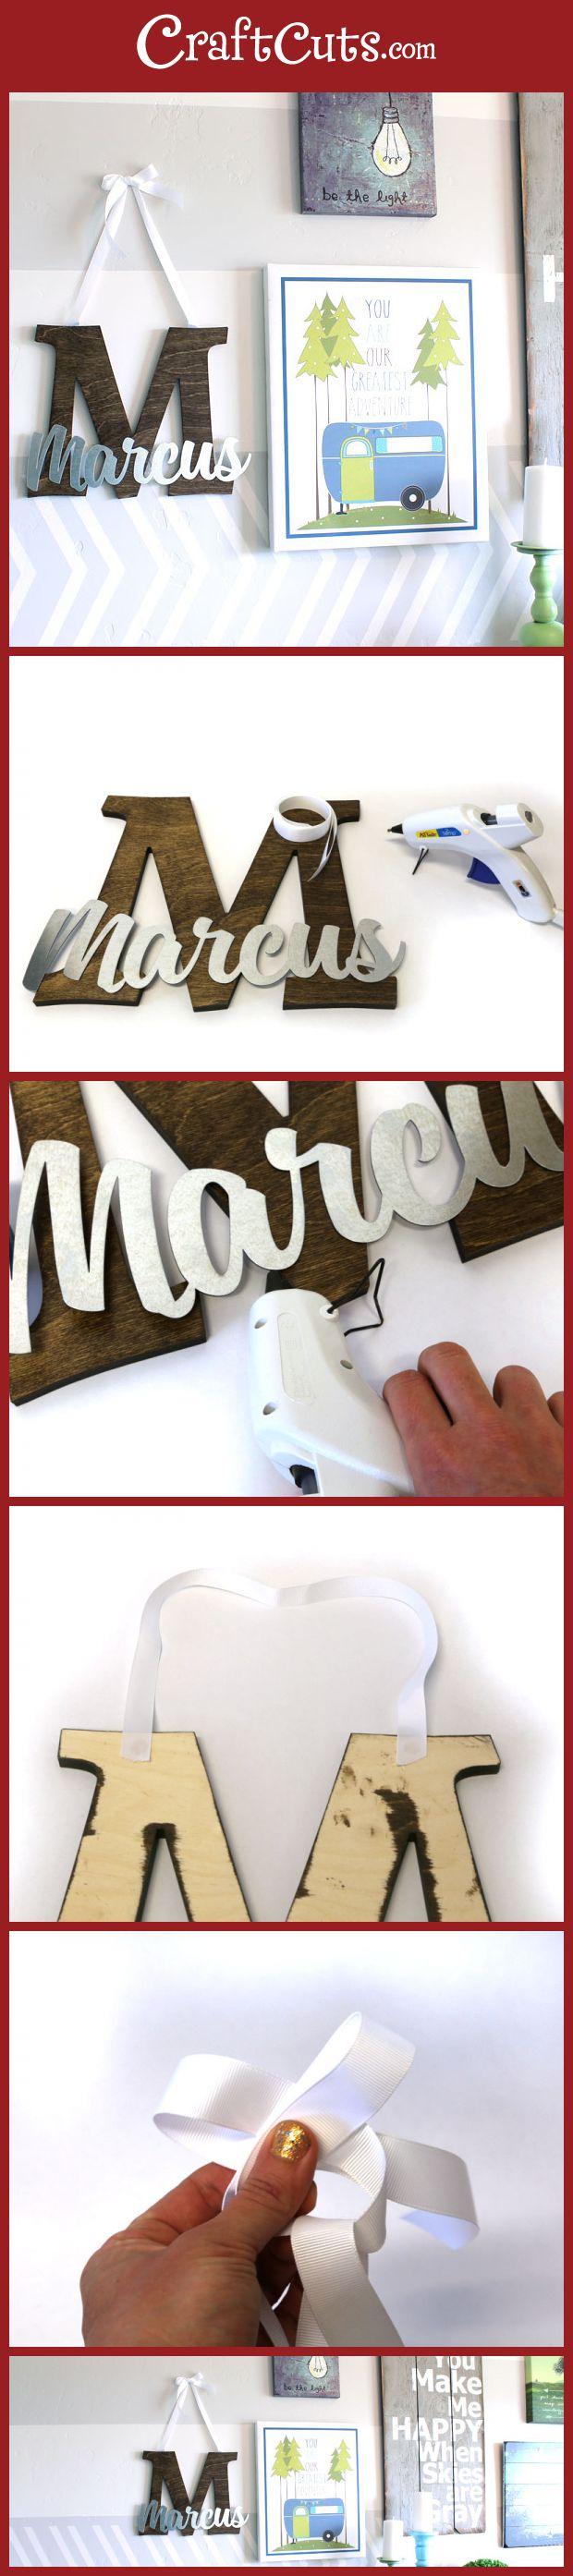 Stained Wood Monogram and Name Wreath   Nursery Monogram   Hanging Monogram   CraftCuts.com